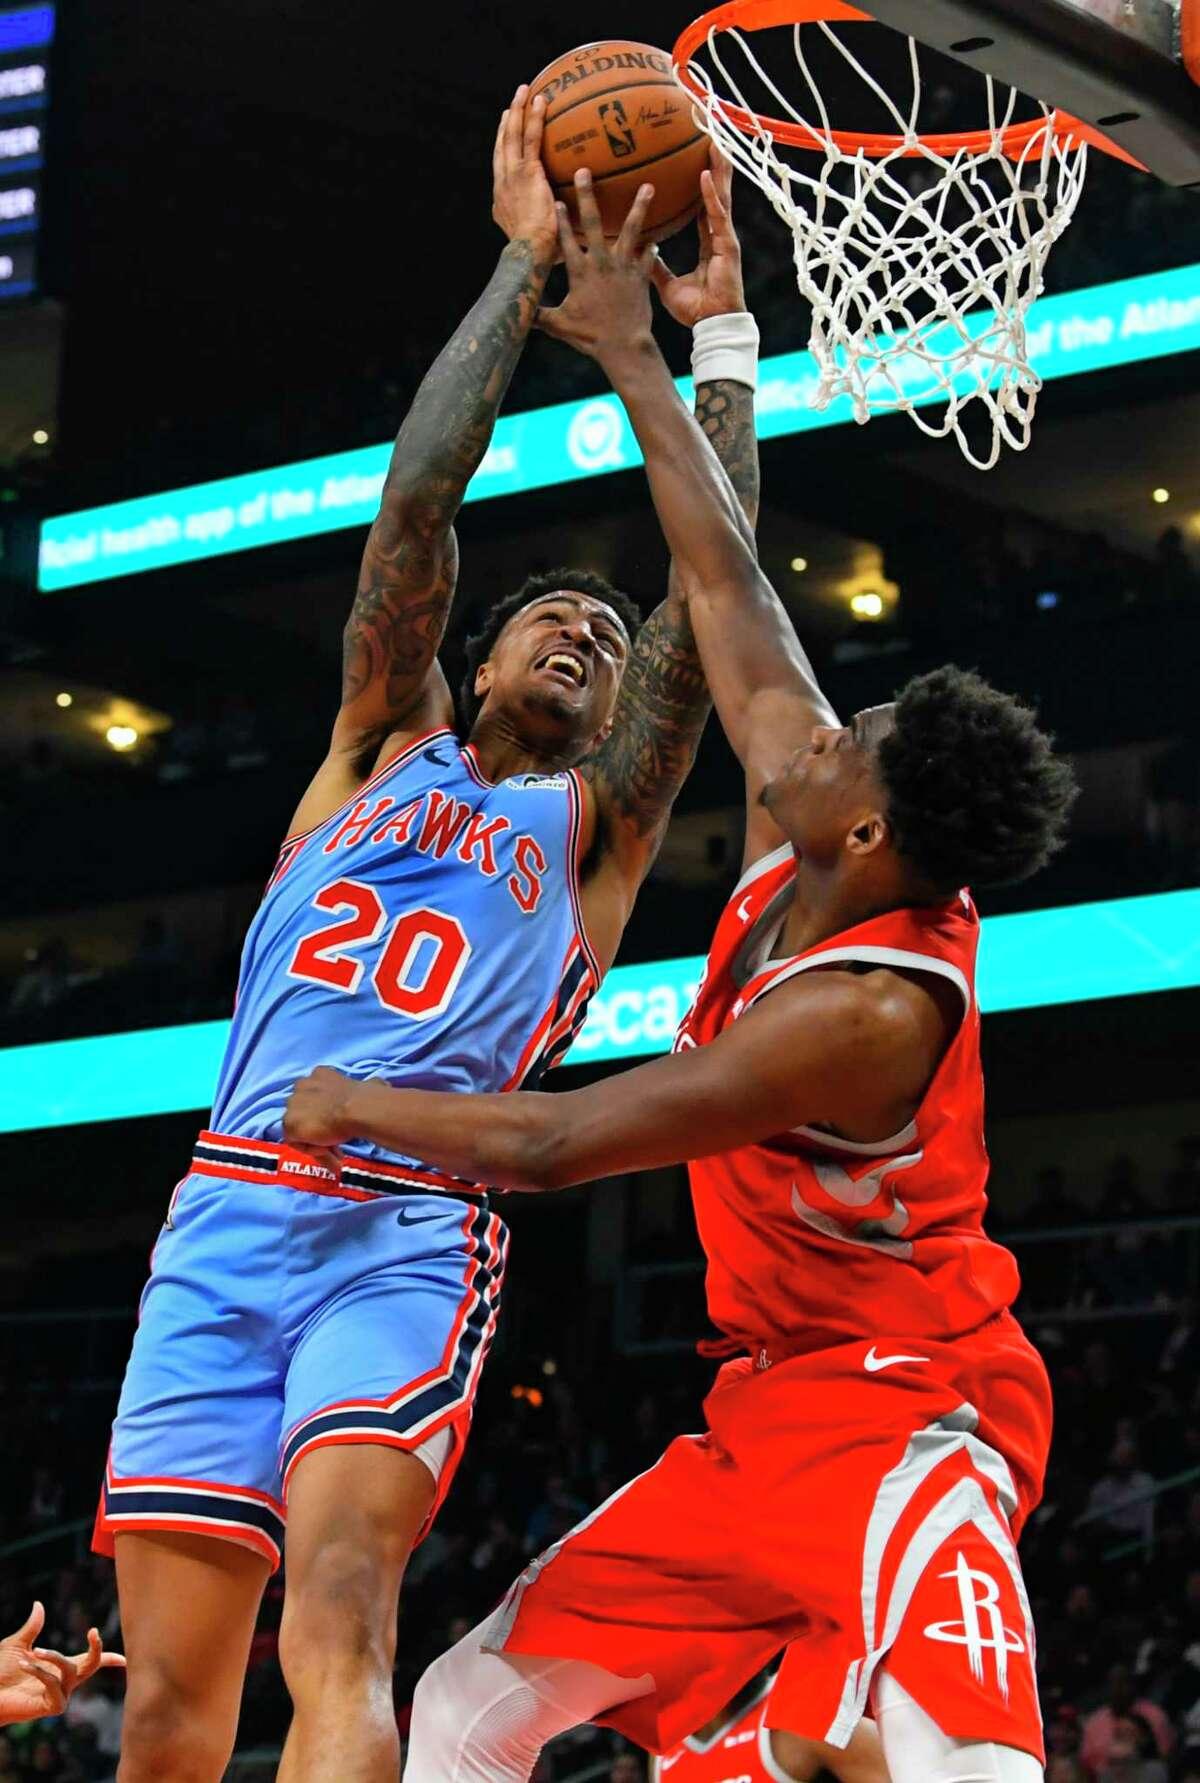 Atlanta Hawks forward John Collins (20) is fouled shooting by Houston Rockets forward Danuel House Jr. during the second quarter of an NBA basketball game Tuesday, March 19, in Atlanta. (AP Photo/John Amis)